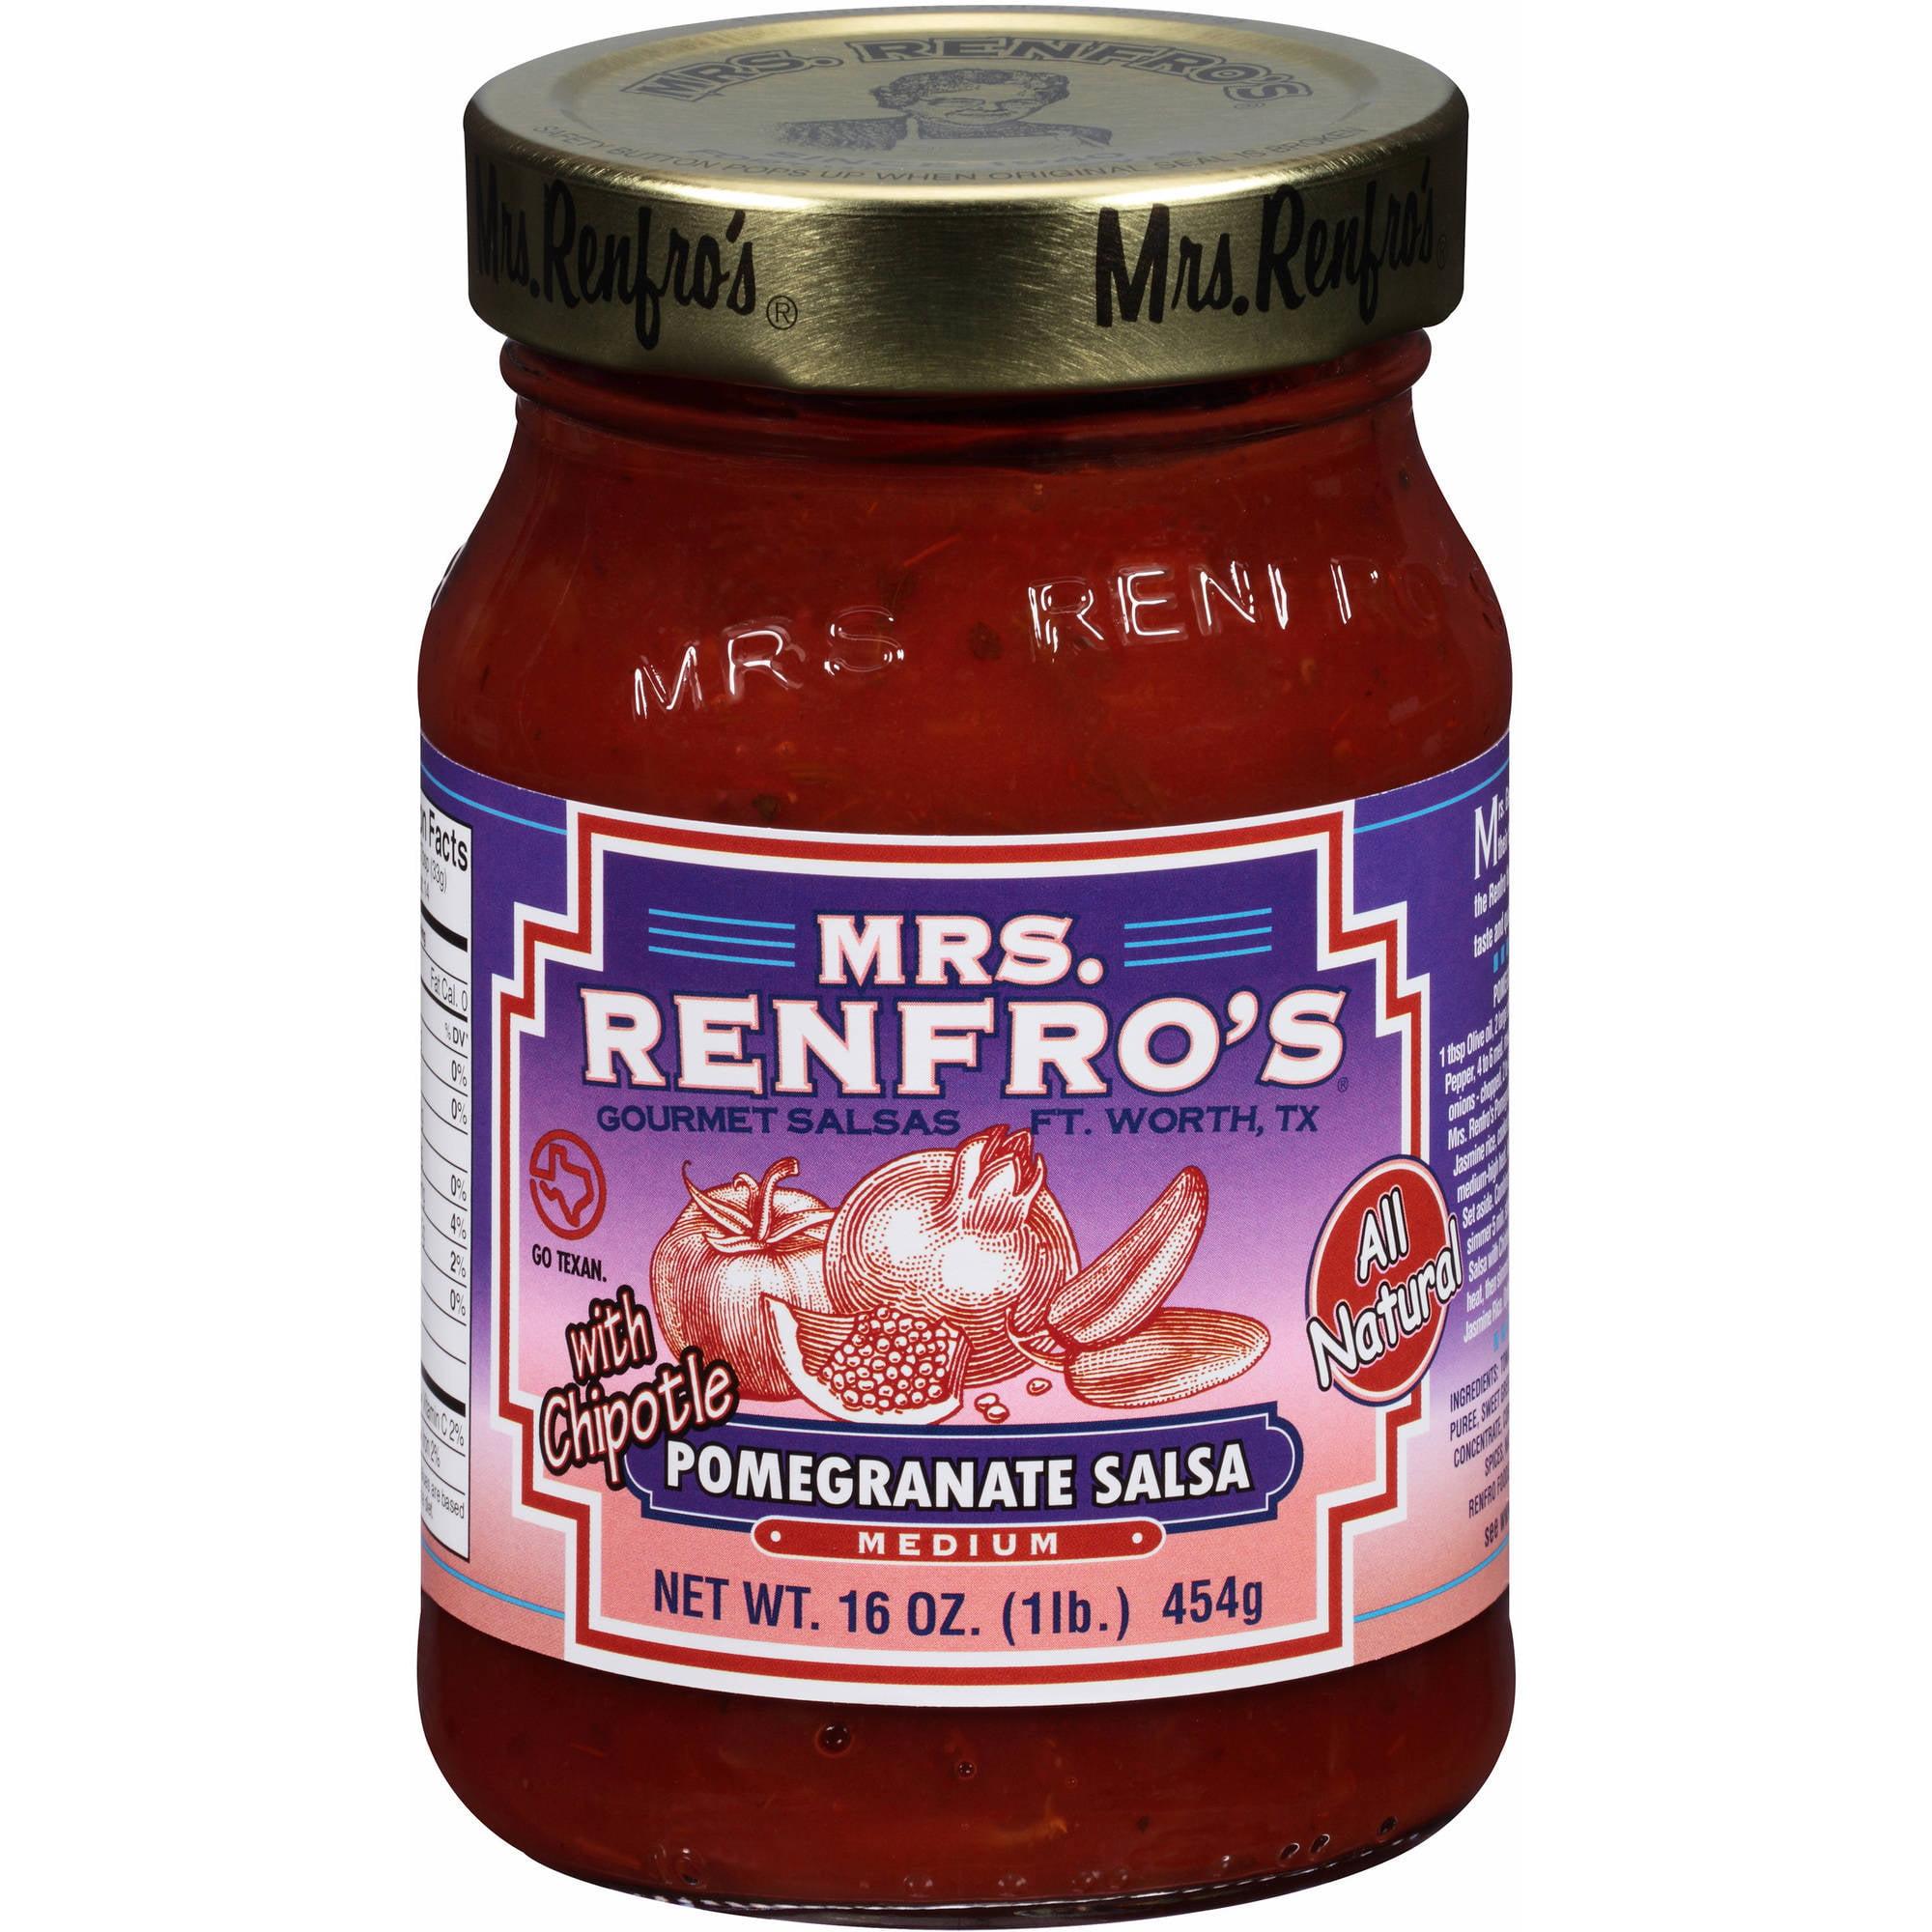 Mrs. Renfro's Gourmet Medium Pomegranate Salsa with Chipotle, 16 oz